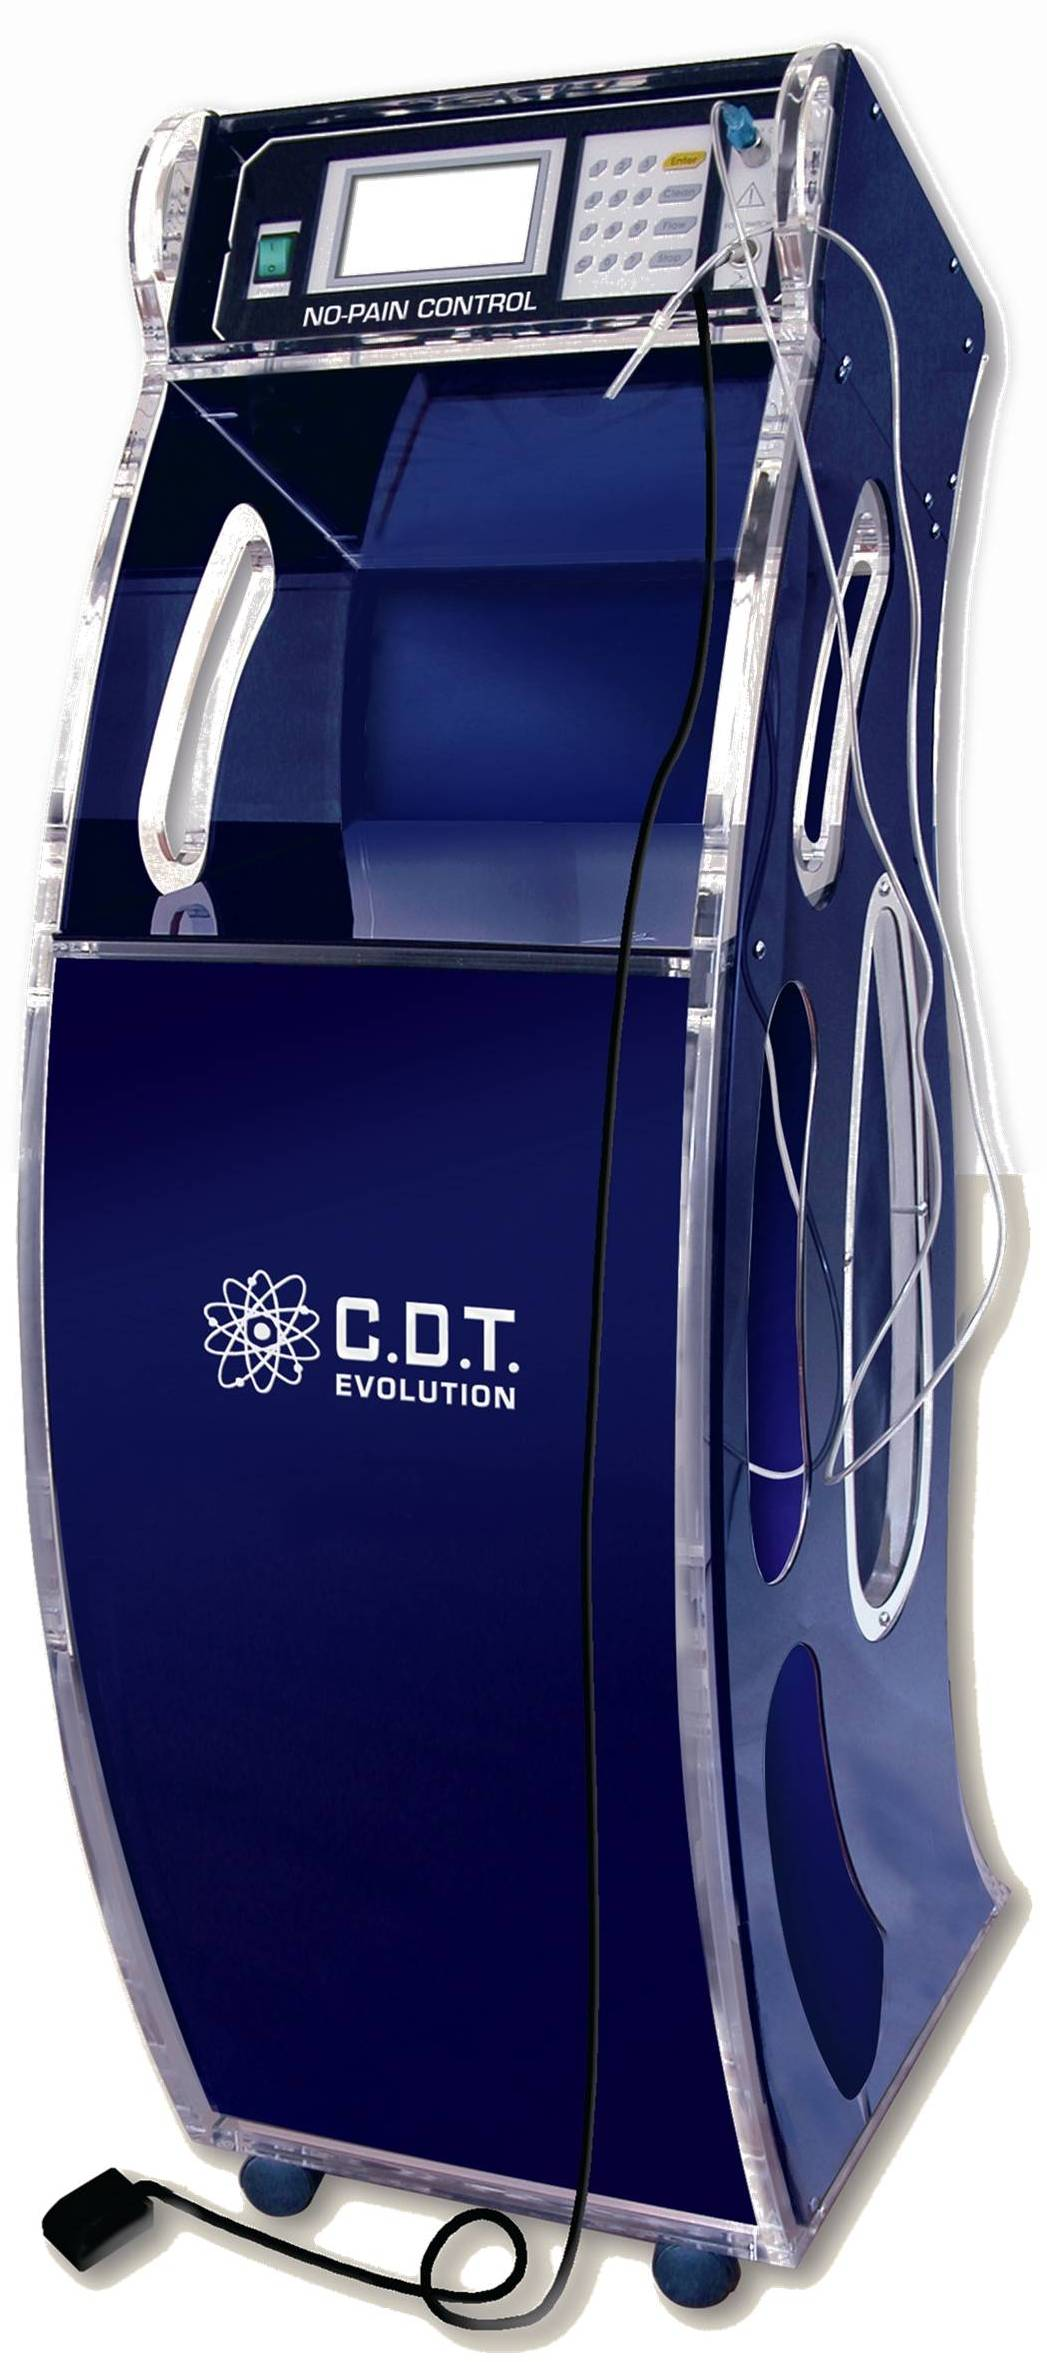 Karboksyterapia CDT Evolution